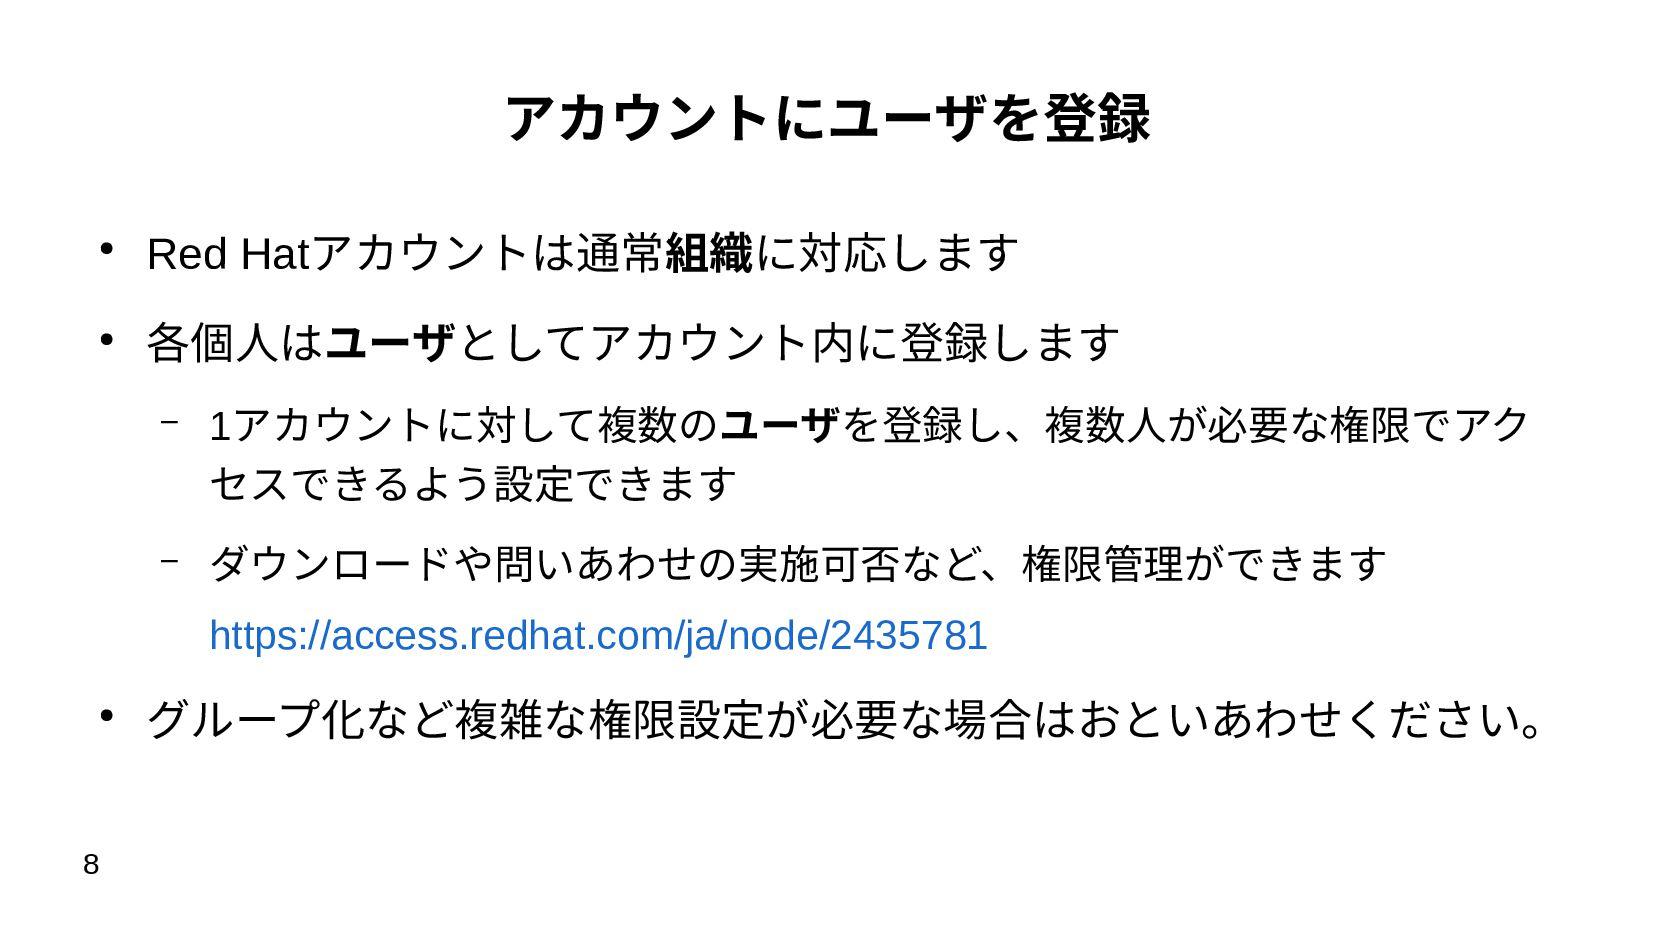 8 Red Hat アカウントの問いあわせ パスワードがわからなくなった、担当者が退職してメー...